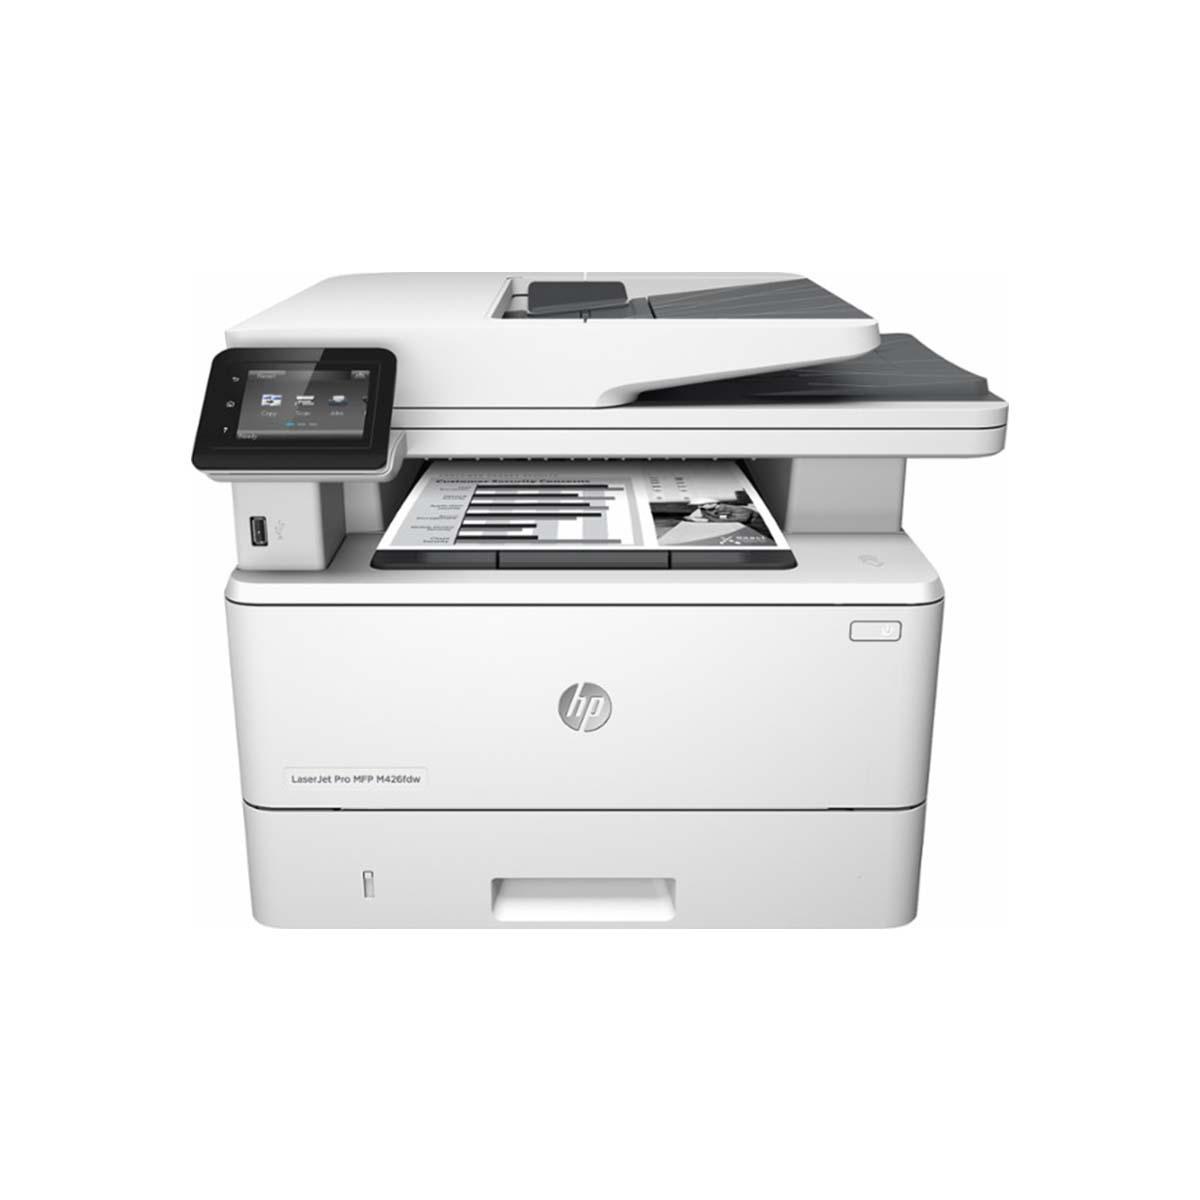 Impresora HP LaserJet Pro M428fdw